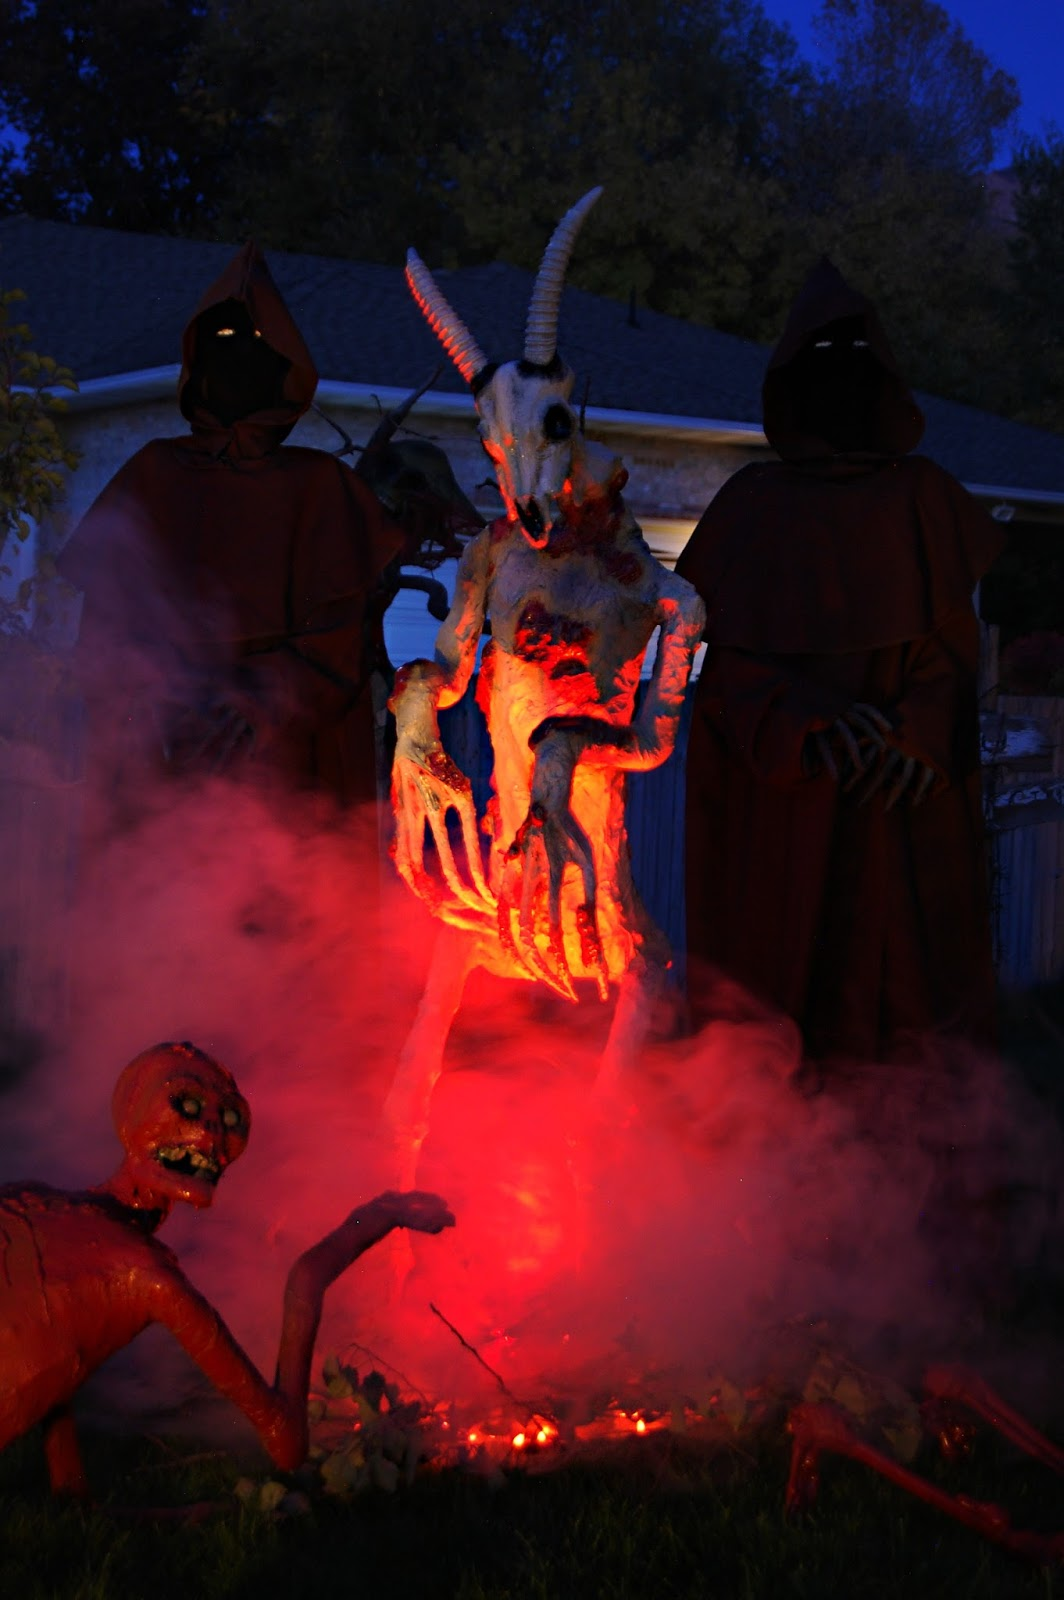 pumpkinrot com the blog deads end yard haunt halloween 2017 rh pumpkinrot blogspot com halloween yard haunt 2012 halloween yard haunt port orange